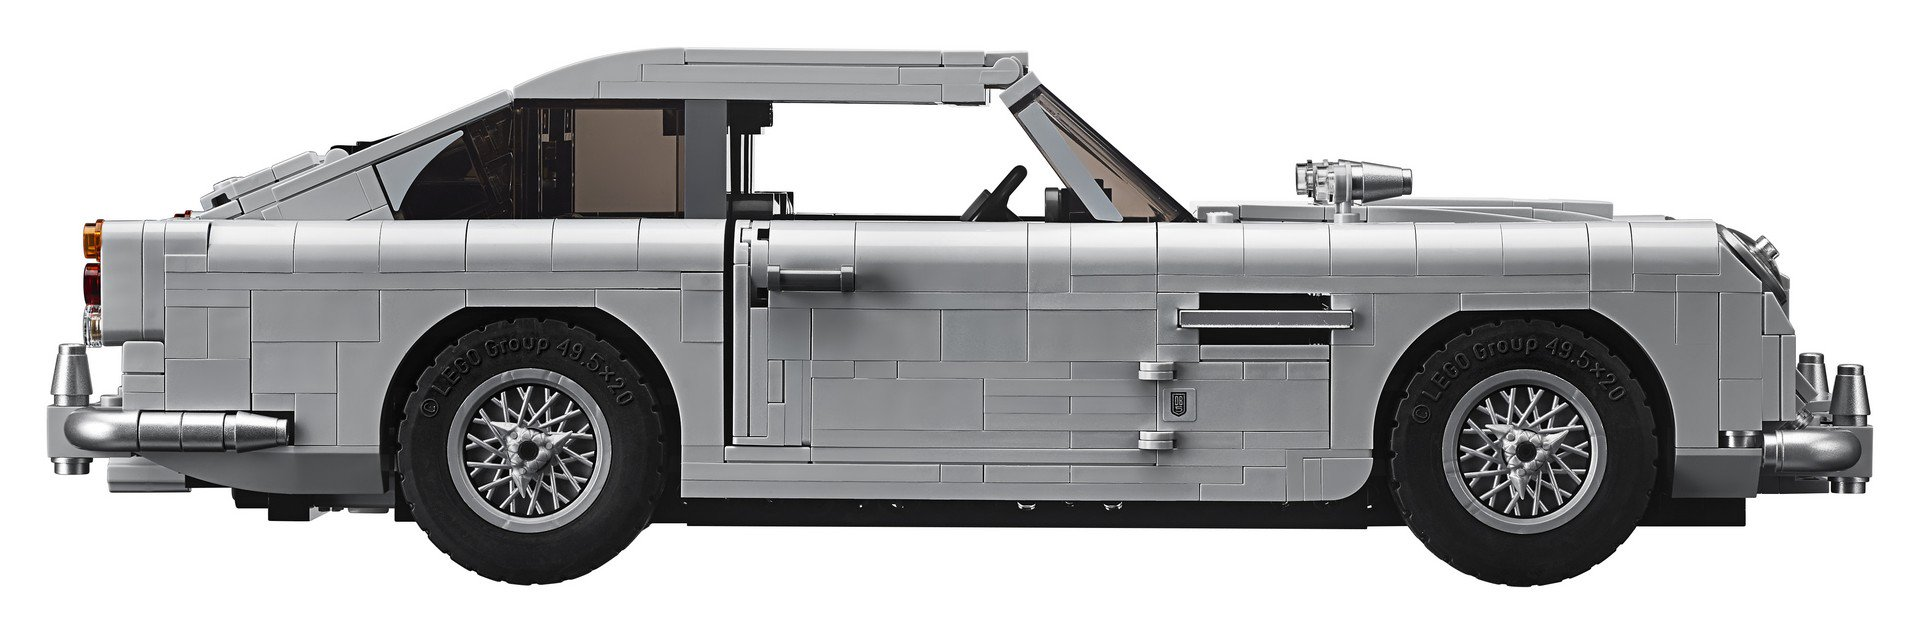 Lego Aston Martin DB5 (71)